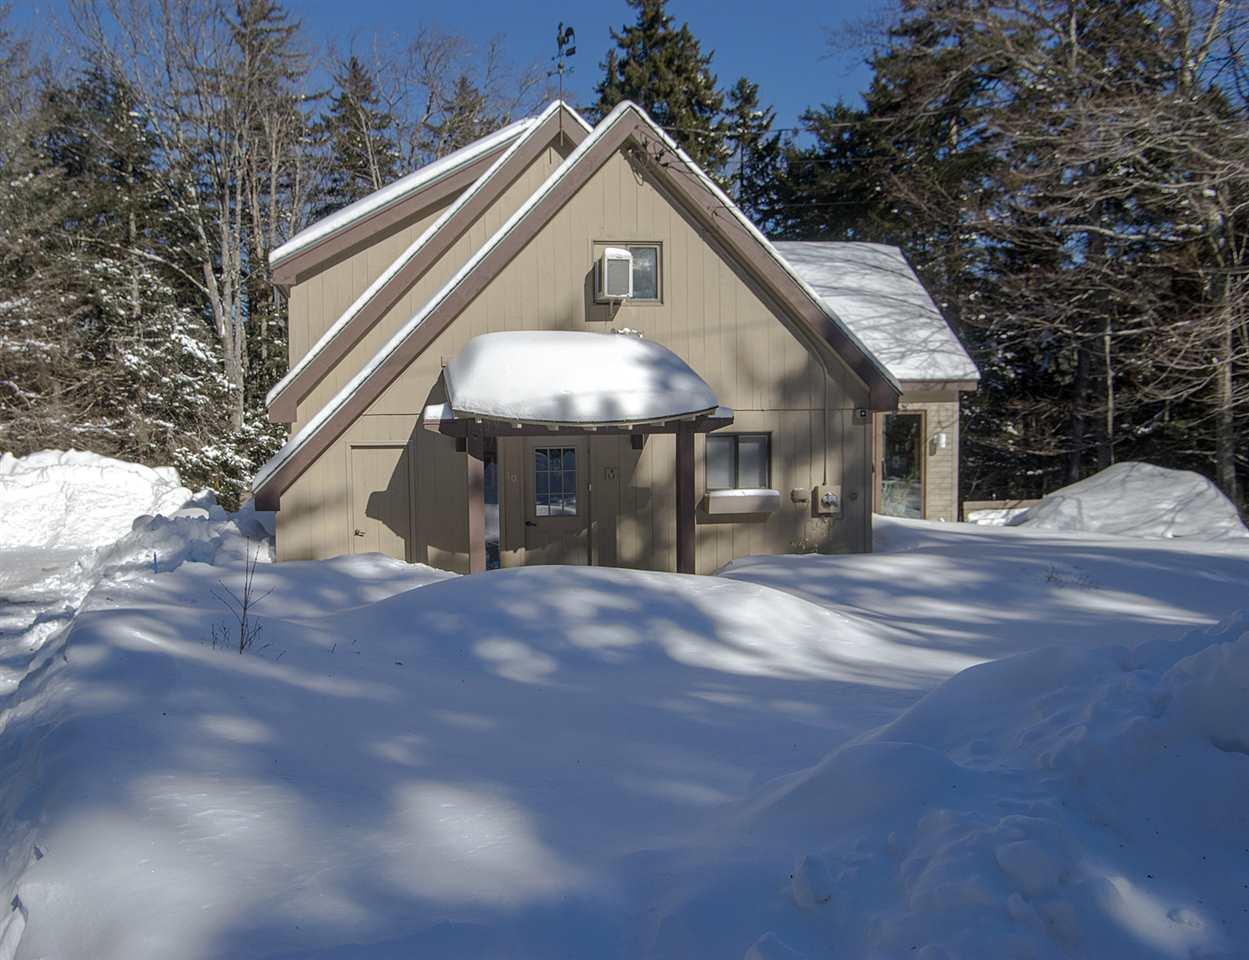 Mount-Snow-Real-Estate-4602469-2